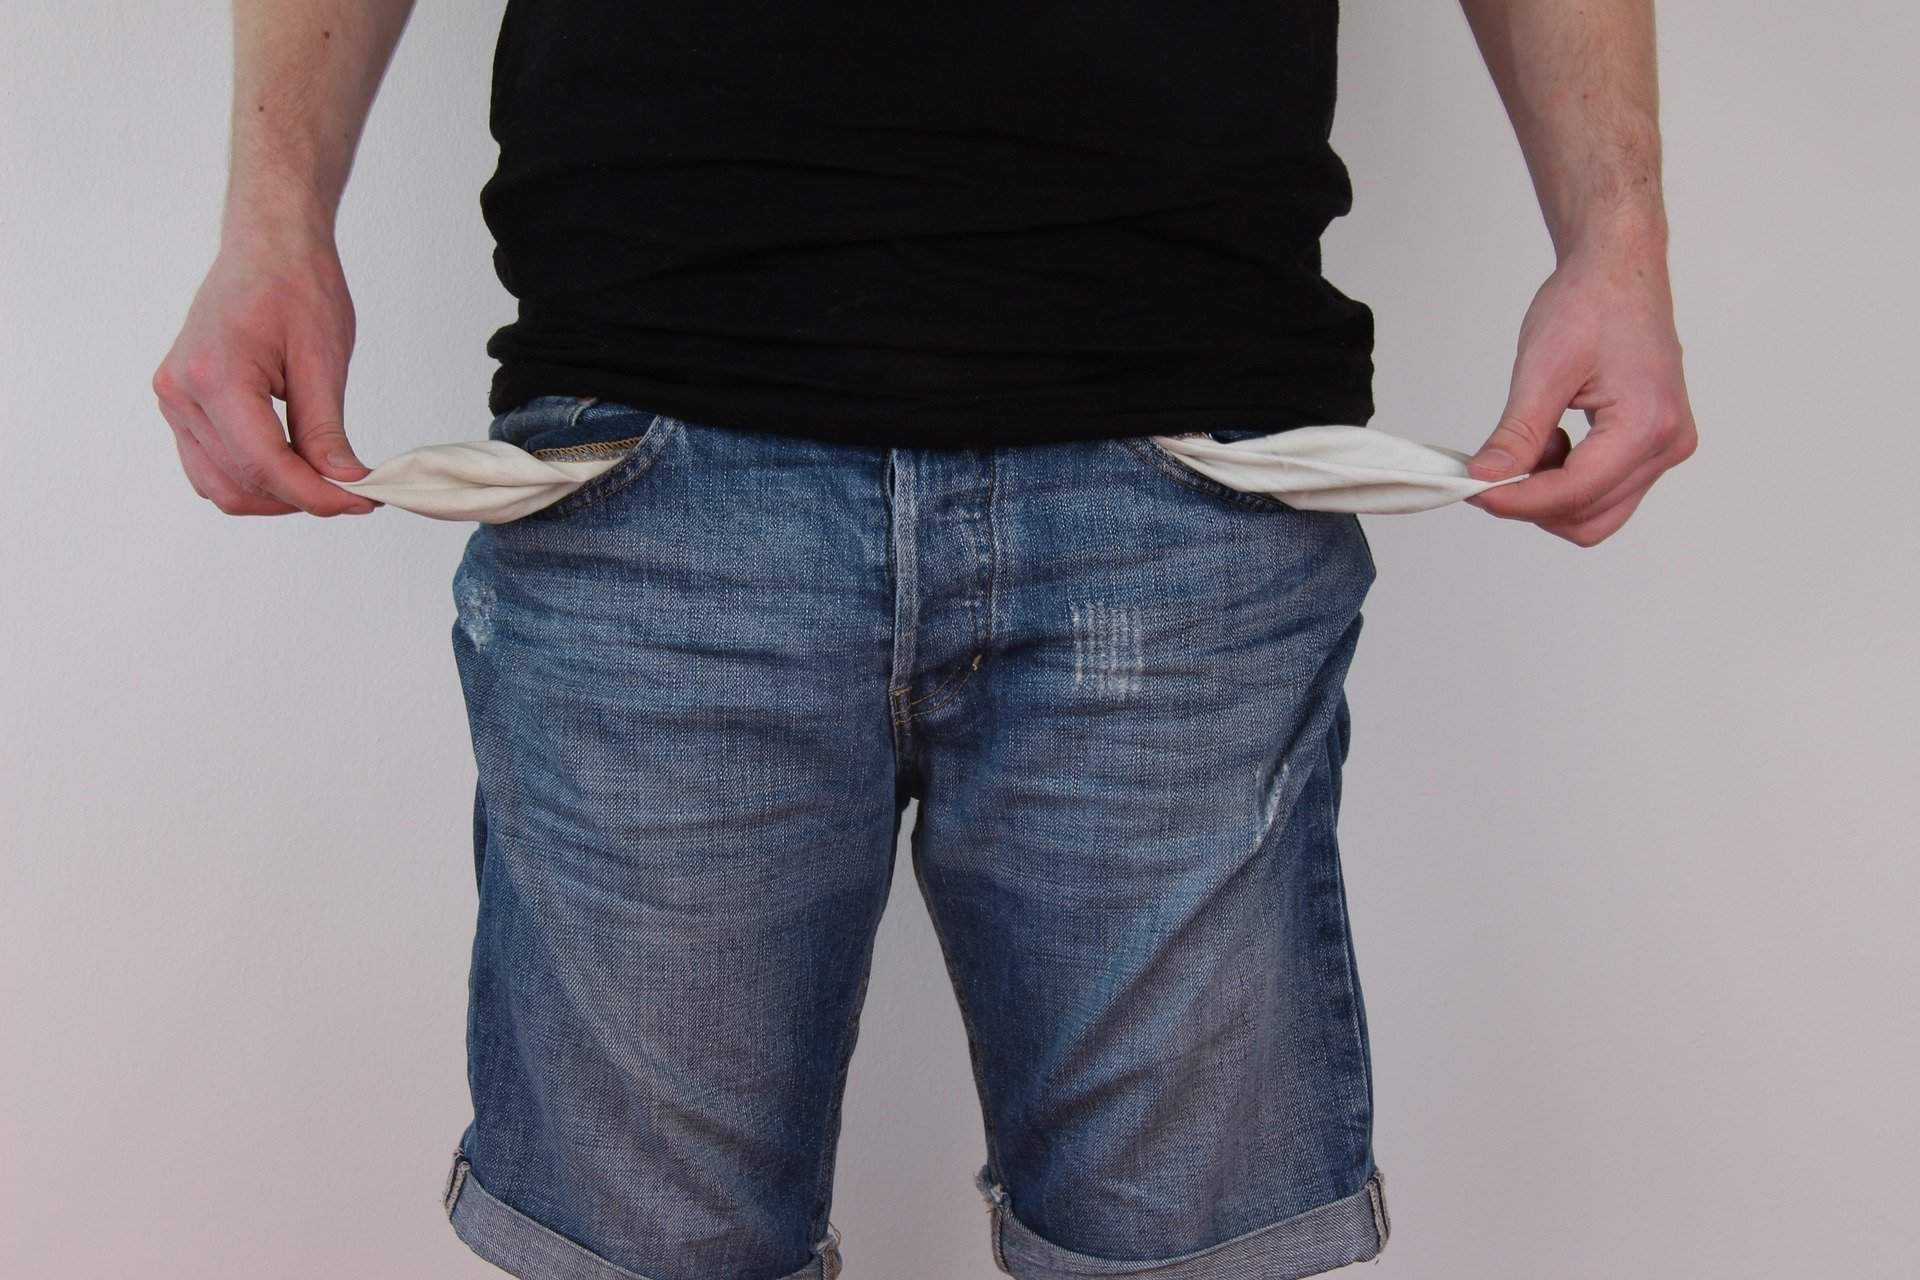 trouser-pockets-poor